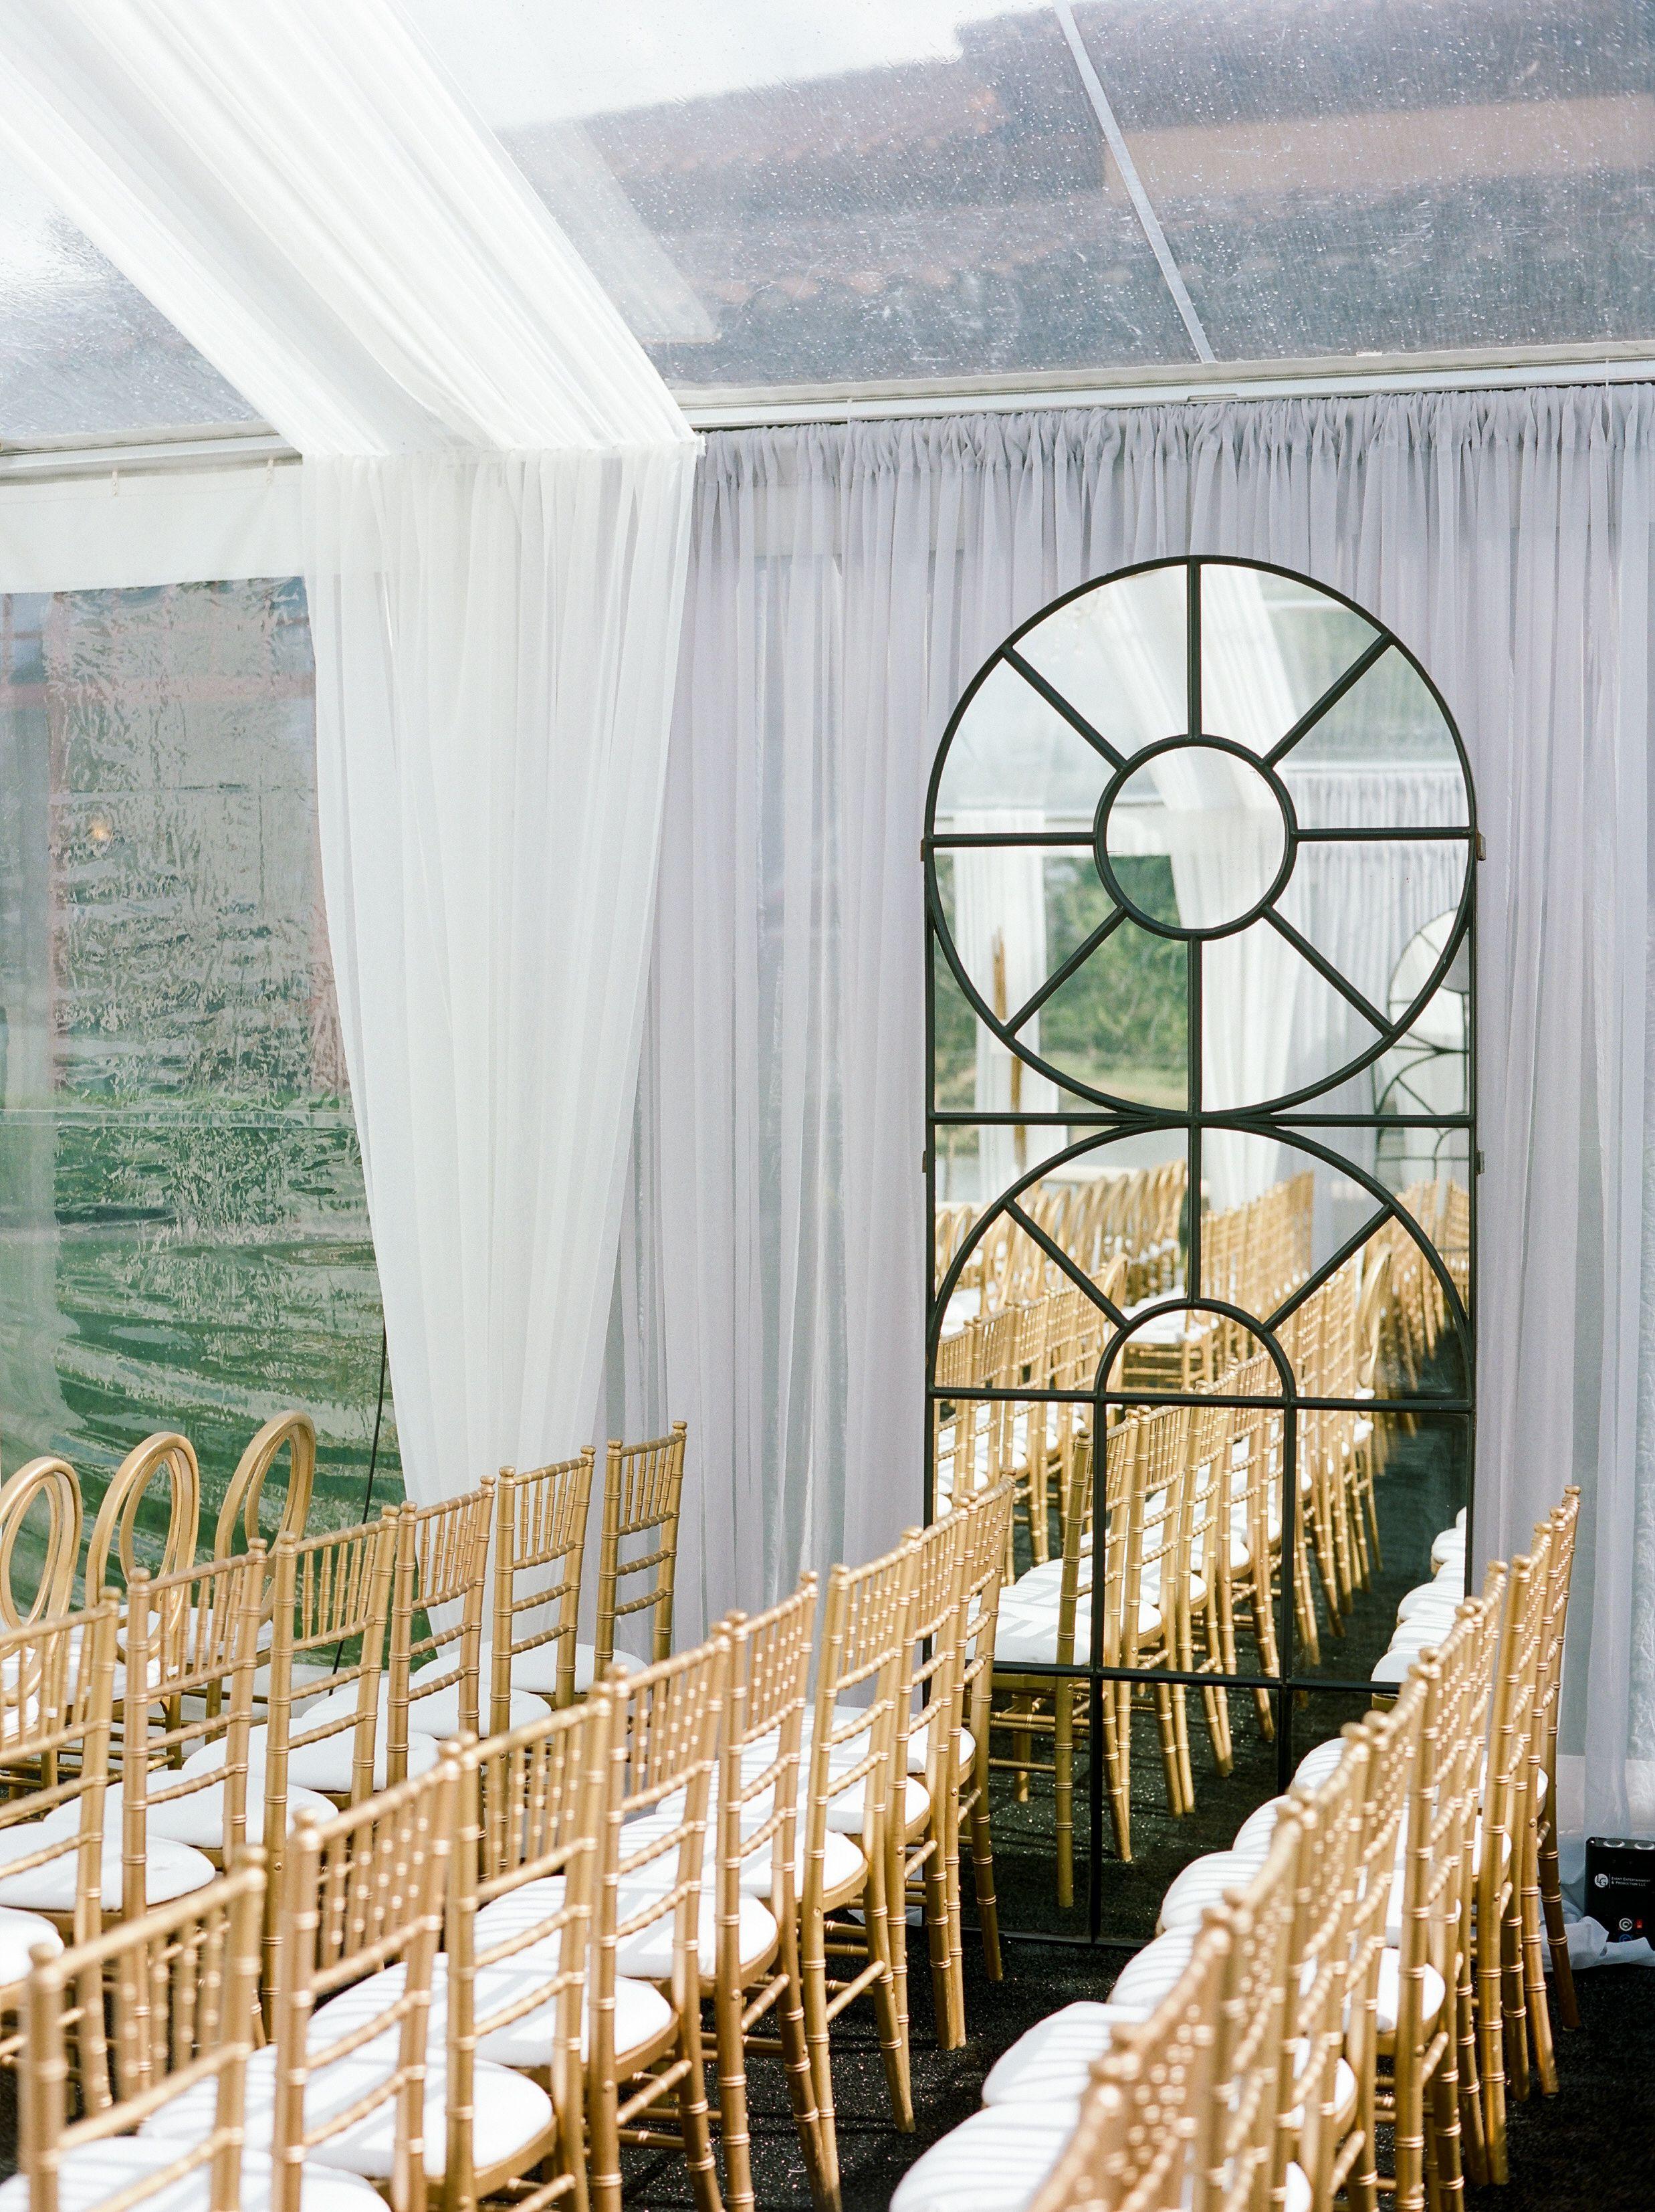 Pin by Alyssa Meeks Events on AME // Weddings in 2020